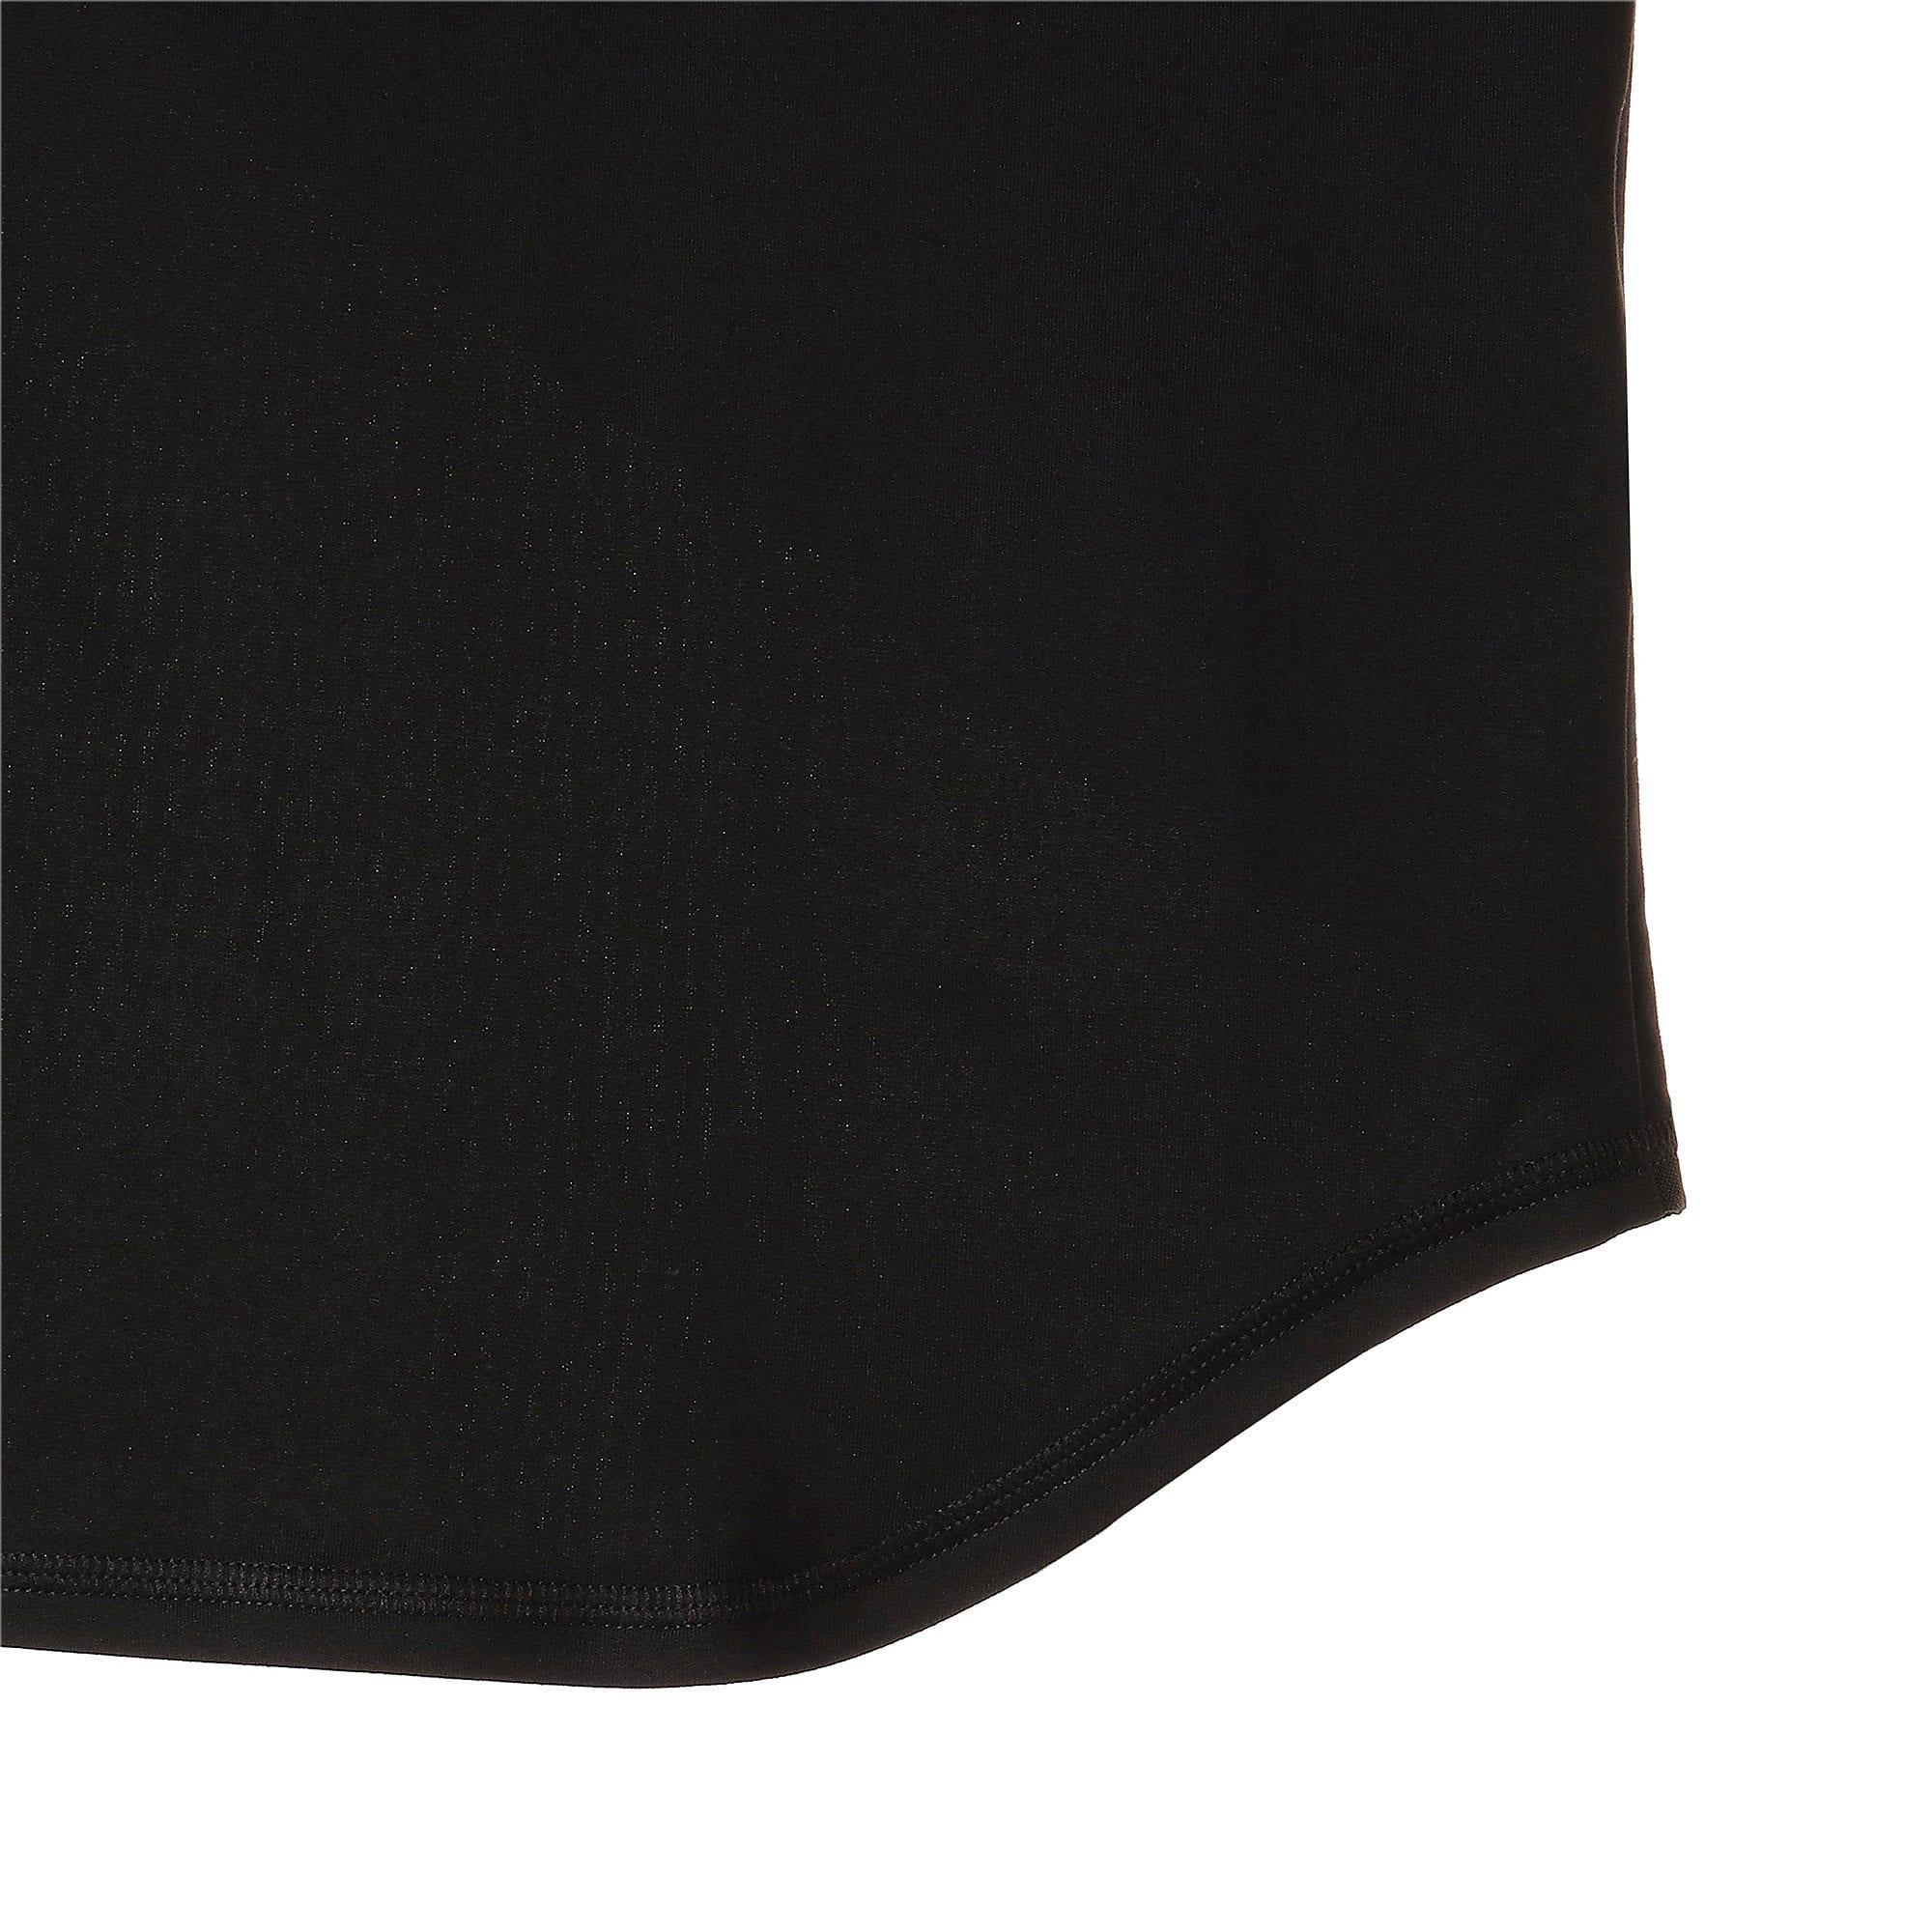 Thumbnail 9 of スタジオ SS メッシュ ウィメンズ トレーニング Tシャツ 半袖, Puma Black, medium-JPN